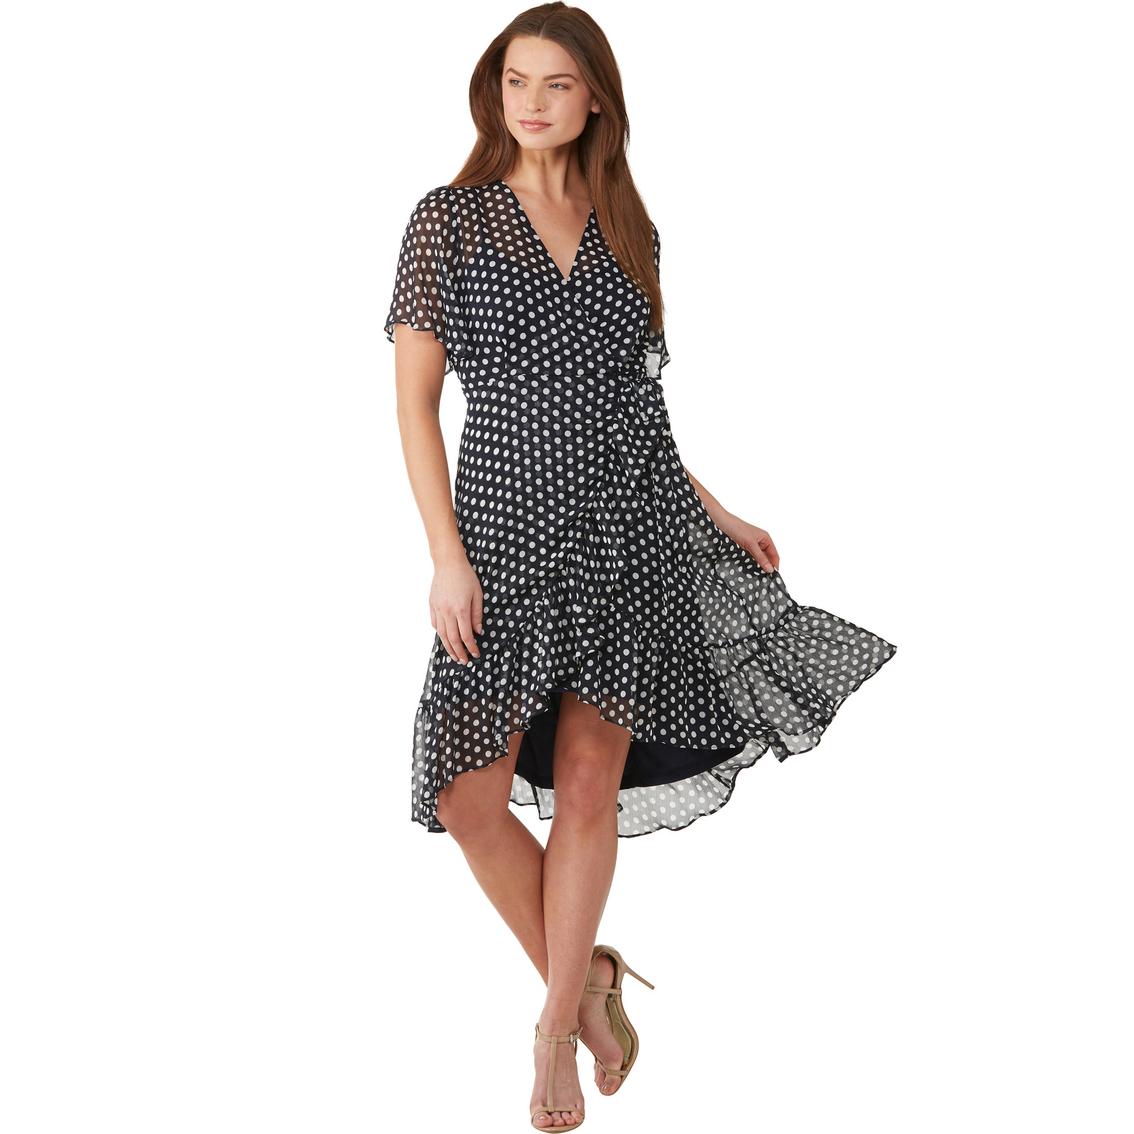 Calvin Klein Ruffle Hem Wrap Dress Dresses Clothing Accessories Shop The Exchange